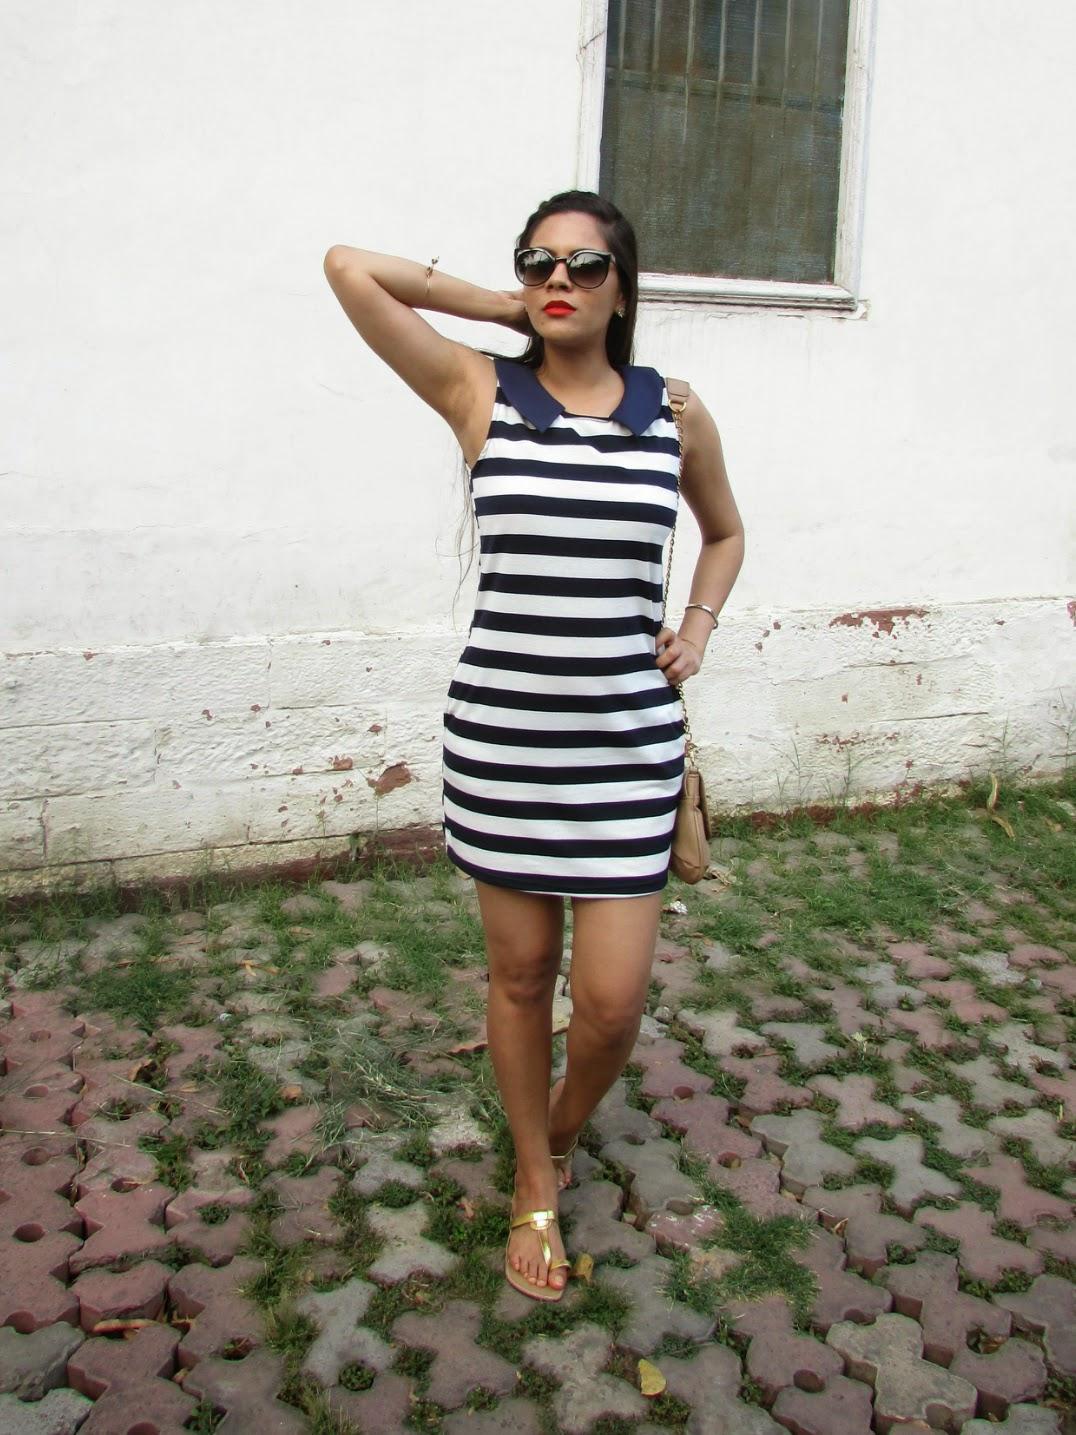 strip dress, cheap strip dress, how to style strip dress, strip dress for summers, blue white strip sleeveless dress, peter pan collar strip dress, fashion, indian fashion blog, cheap dresses online, summer trends 2015, spring dress 2015, beauty , fashion,beauty and fashion,beauty blog, fashion blog , indian beauty blog,indian fashion blog, beauty and fashion blog, indian beauty and fashion blog, indian bloggers, indian beauty bloggers, indian fashion bloggers,indian bloggers online, top 10 indian bloggers, top indian bloggers,top 10 fashion bloggers, indian bloggers on blogspot,home remedies, how to